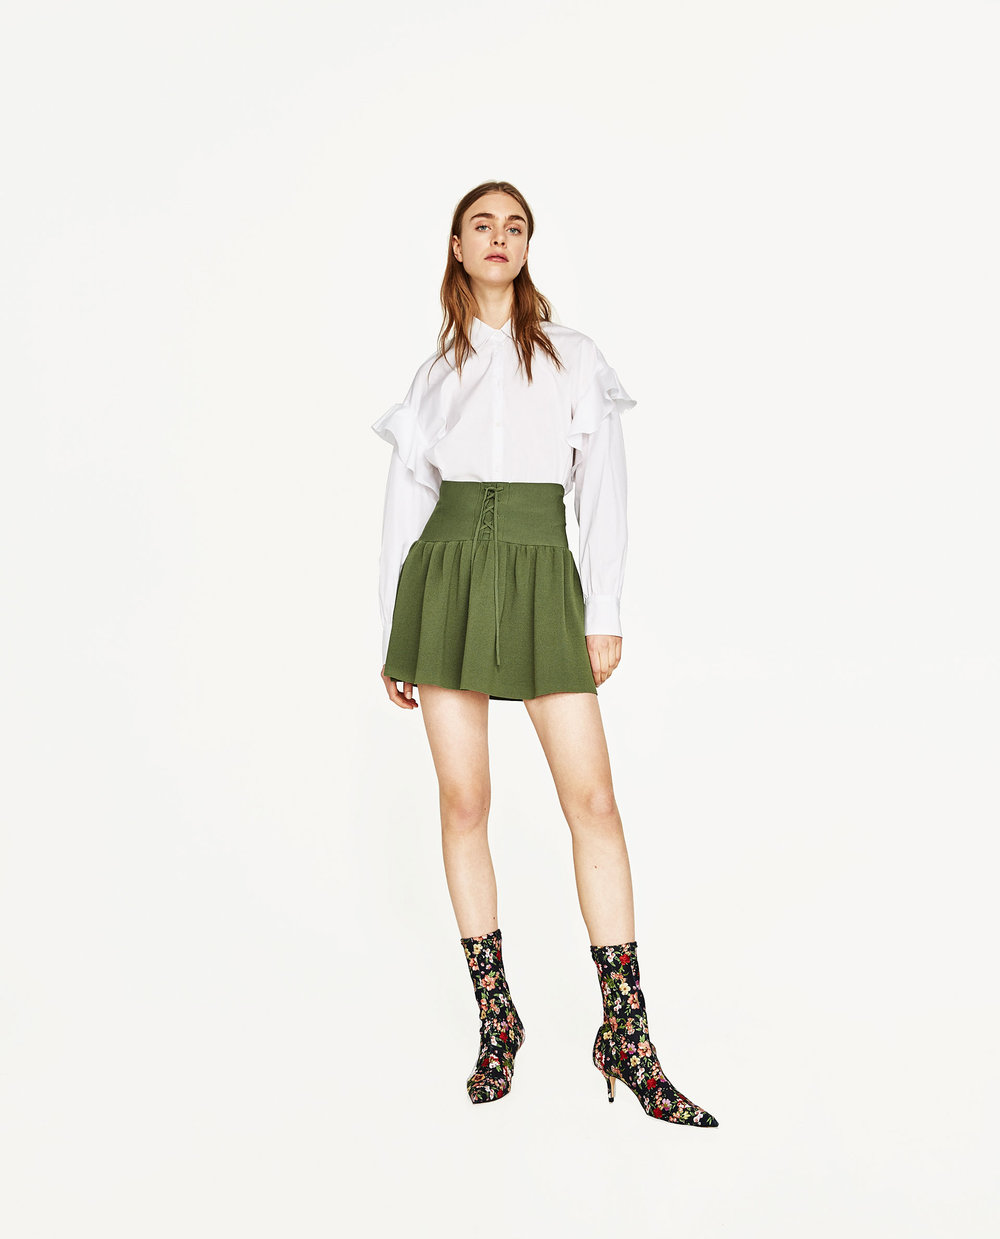 Zara Ruffle Shirt